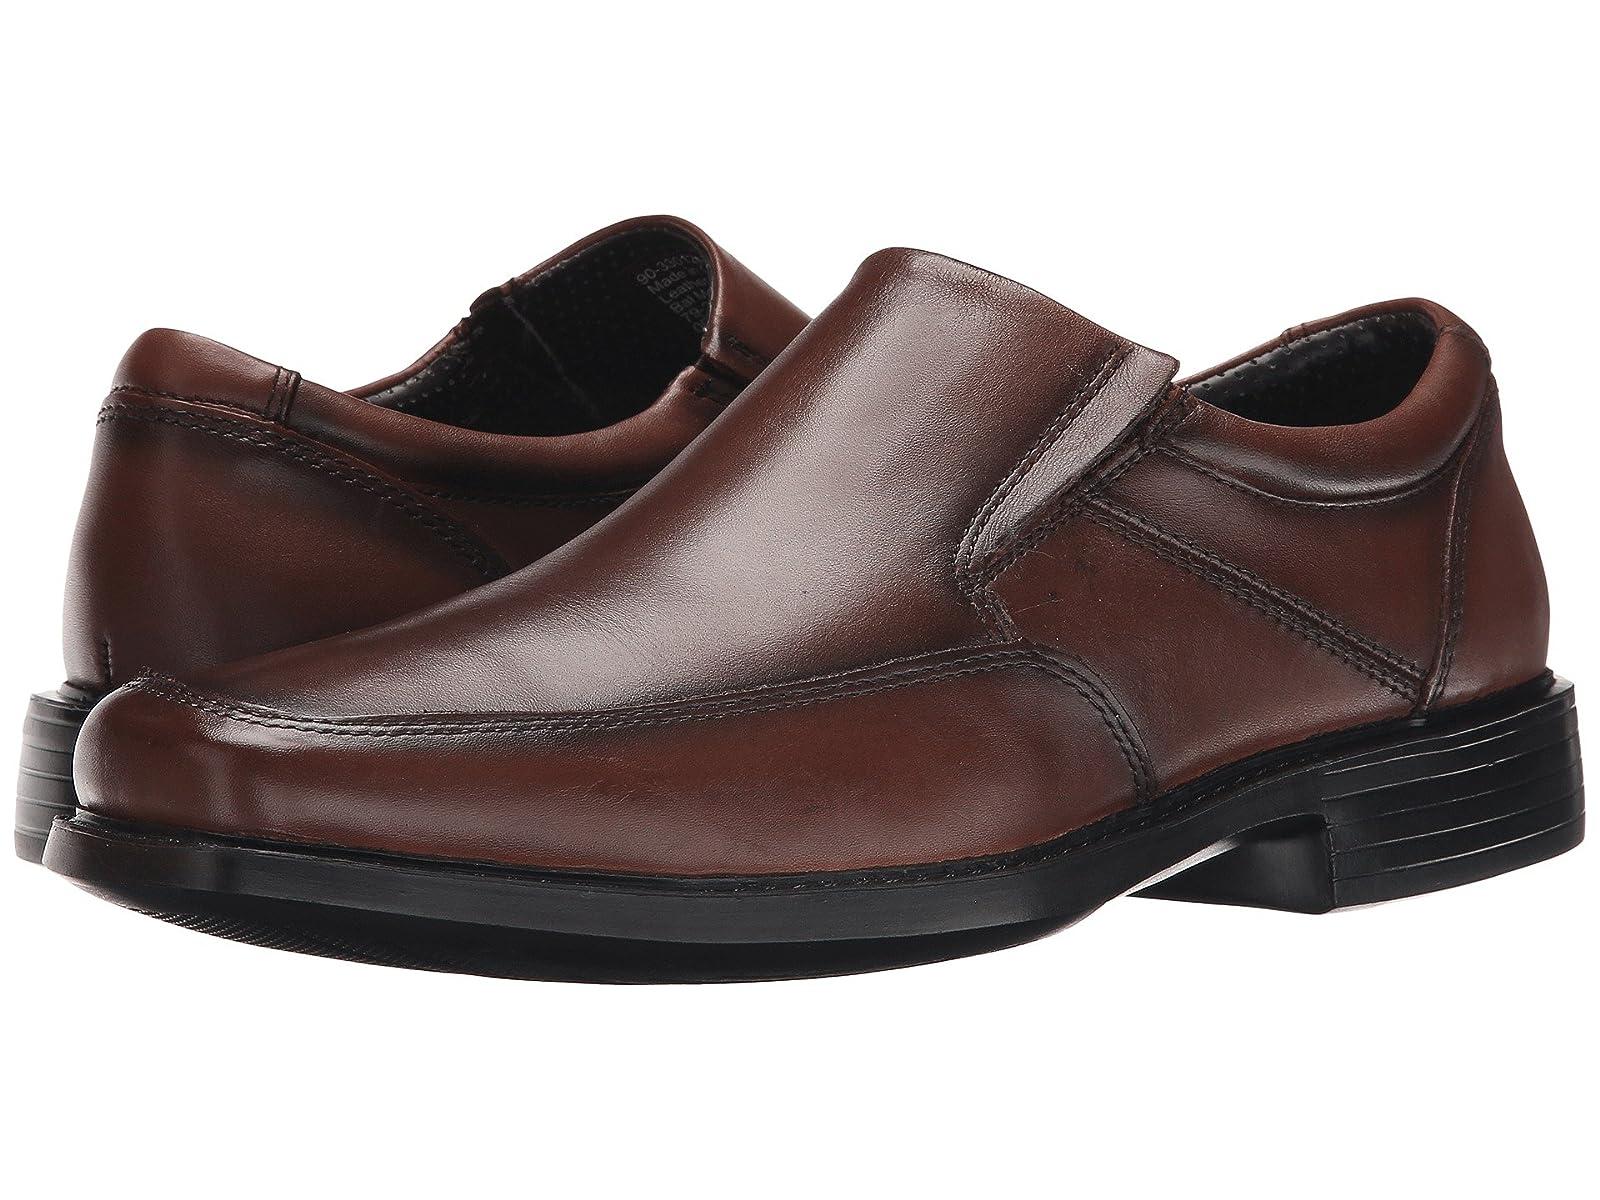 Dockers Park Moc Toe Slip-OnAtmospheric grades have affordable shoes